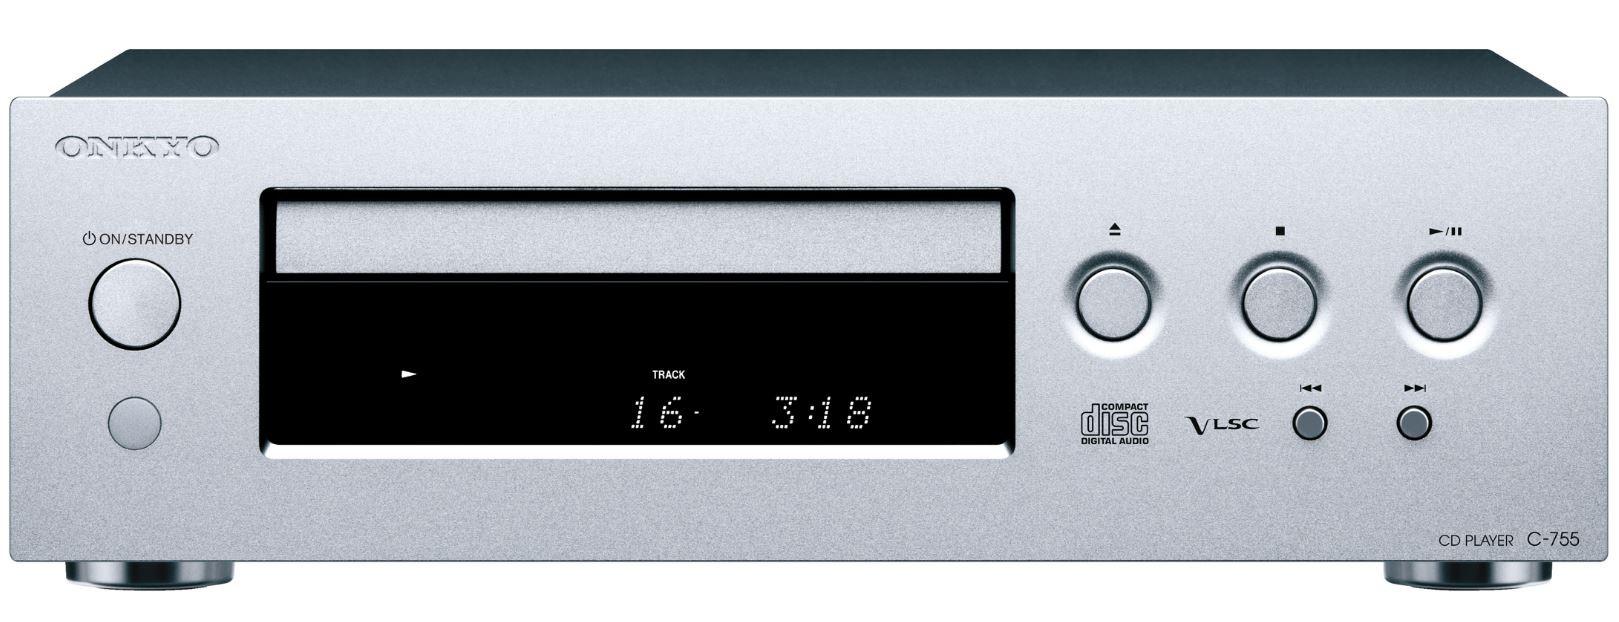 Onkyo C-755 CD Player - Silver